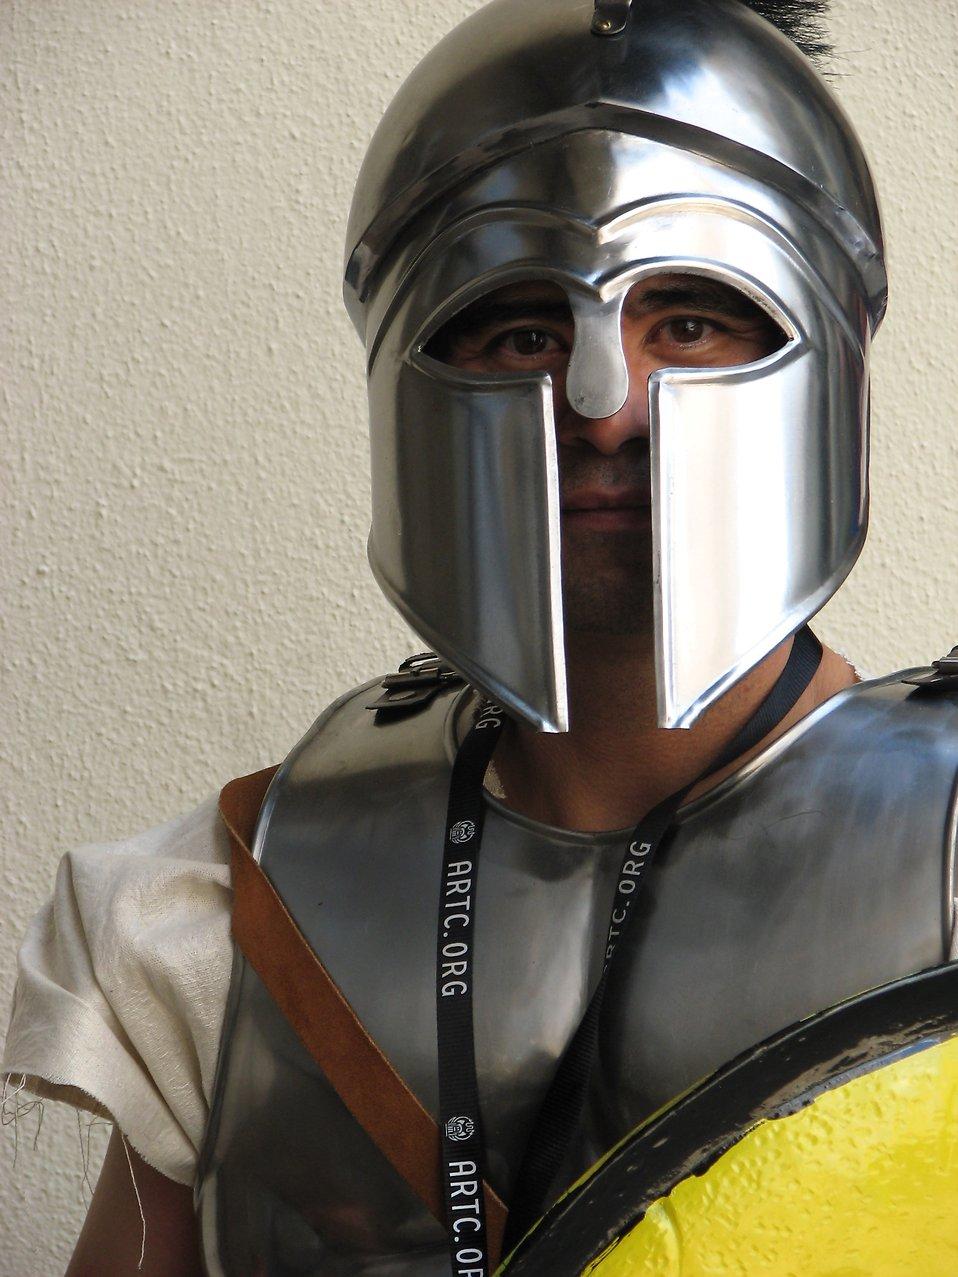 Closeup of man in Spartan armor at Dragoncon 2008 : Free Stock Photo